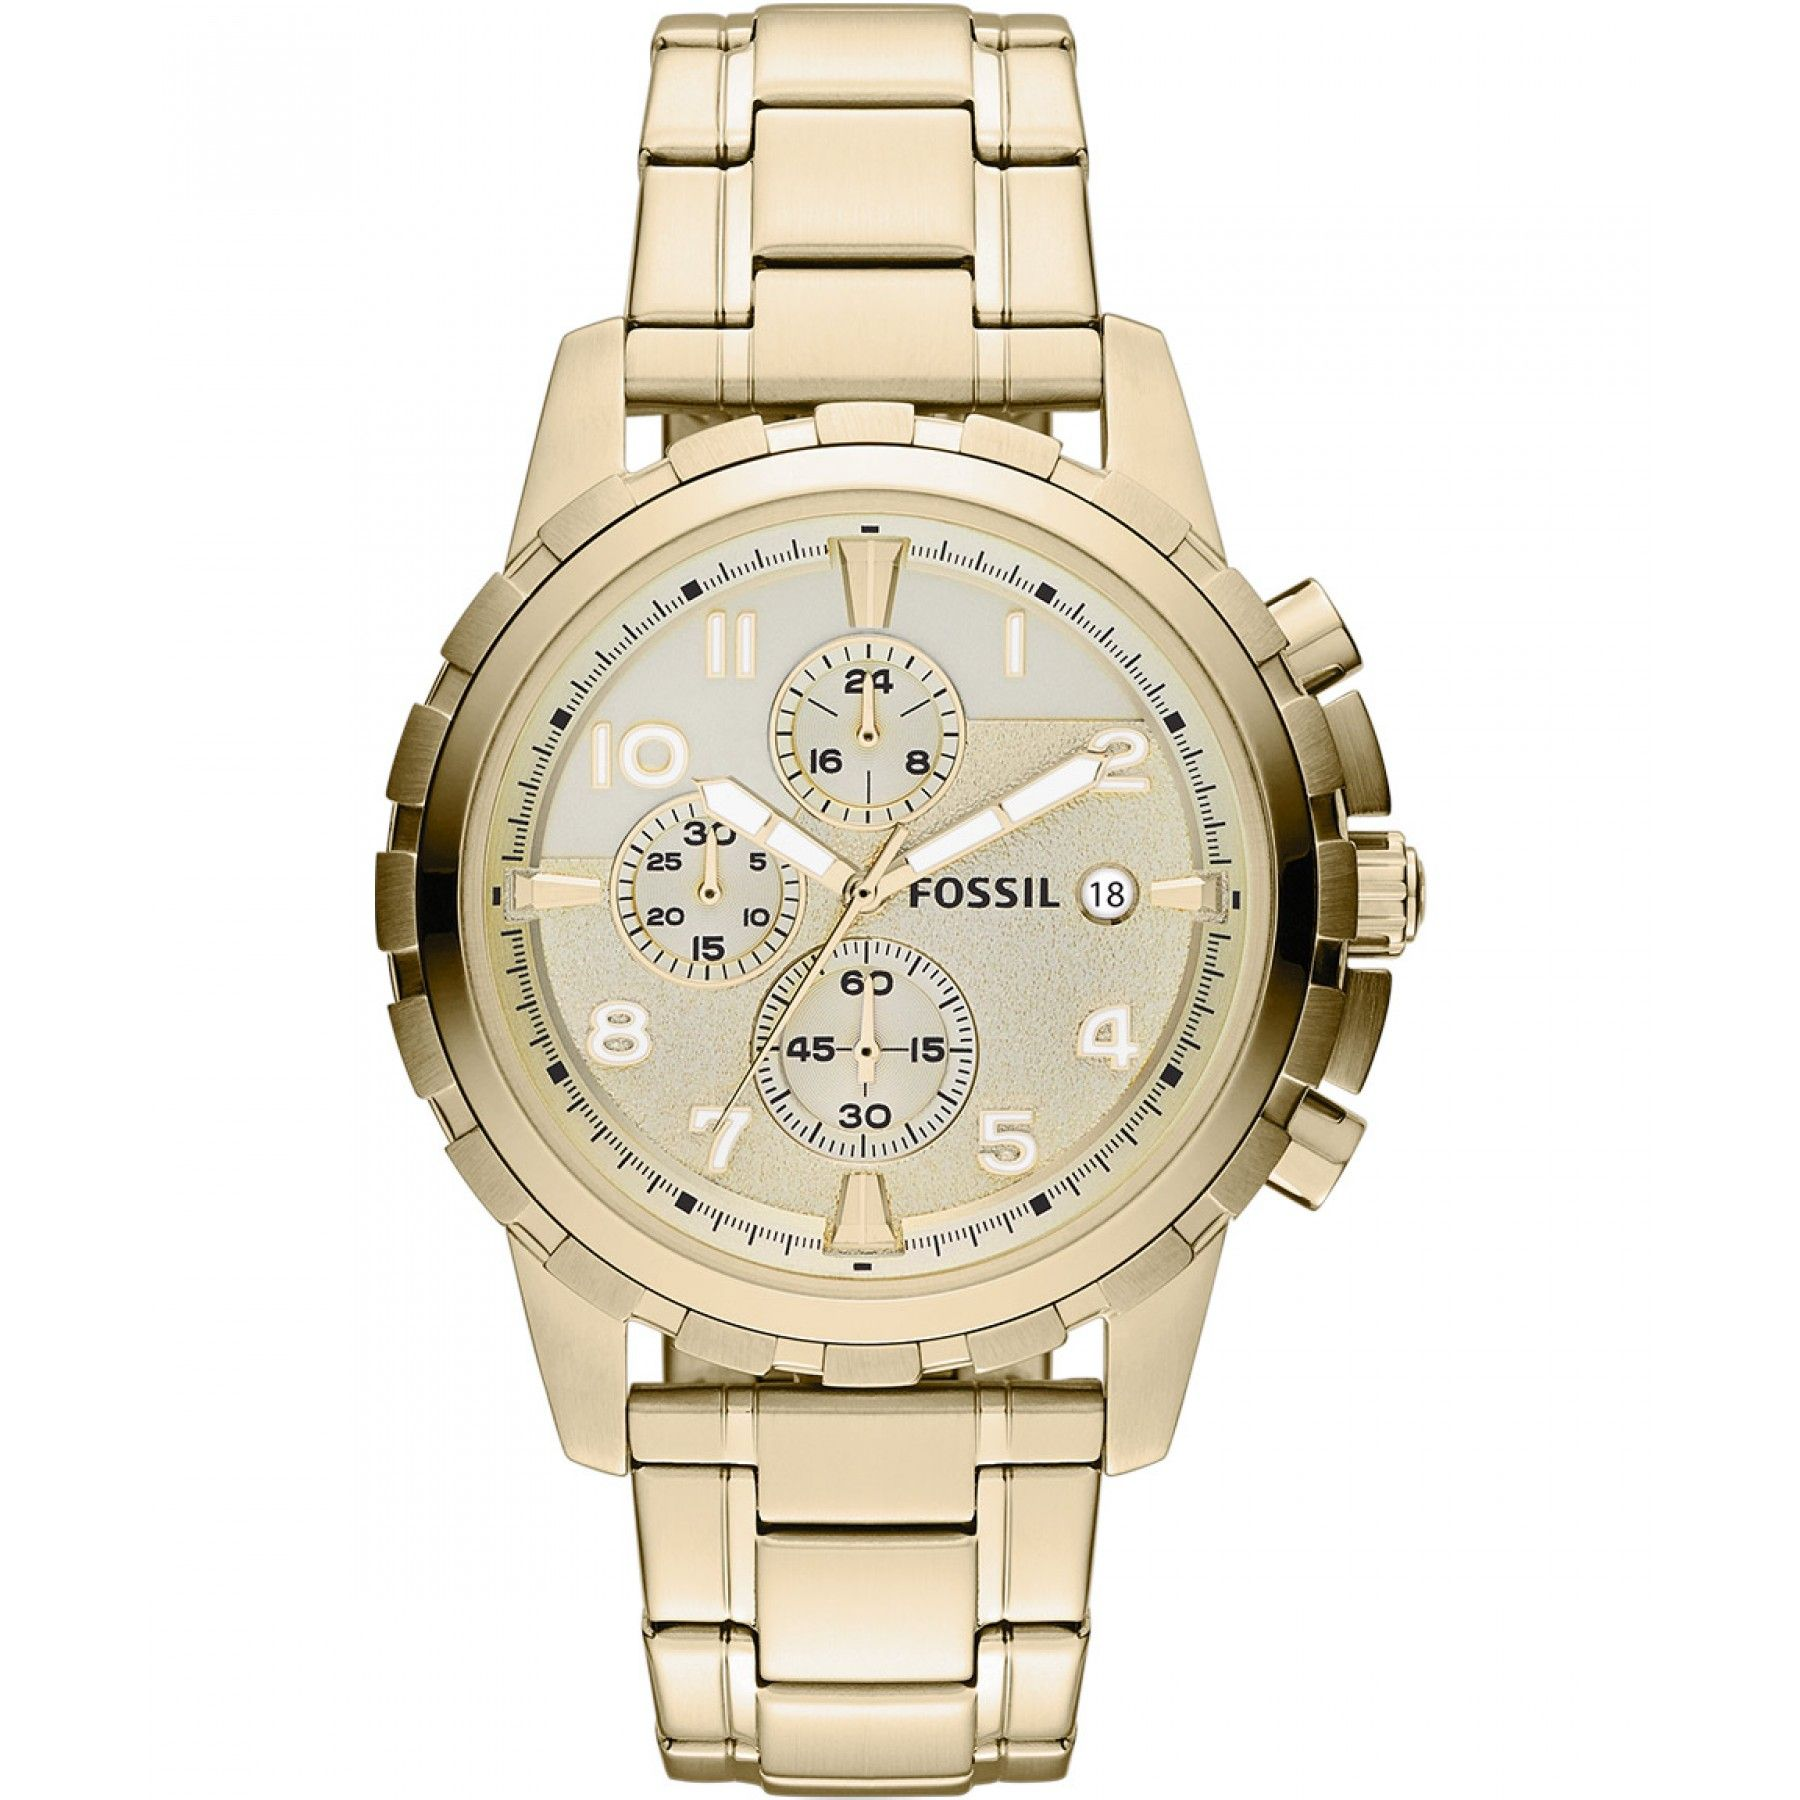 e68ec41e7231 Reloj Fossil de caja bisel con extensible en acero color oro carátula  blanca y manecillas e